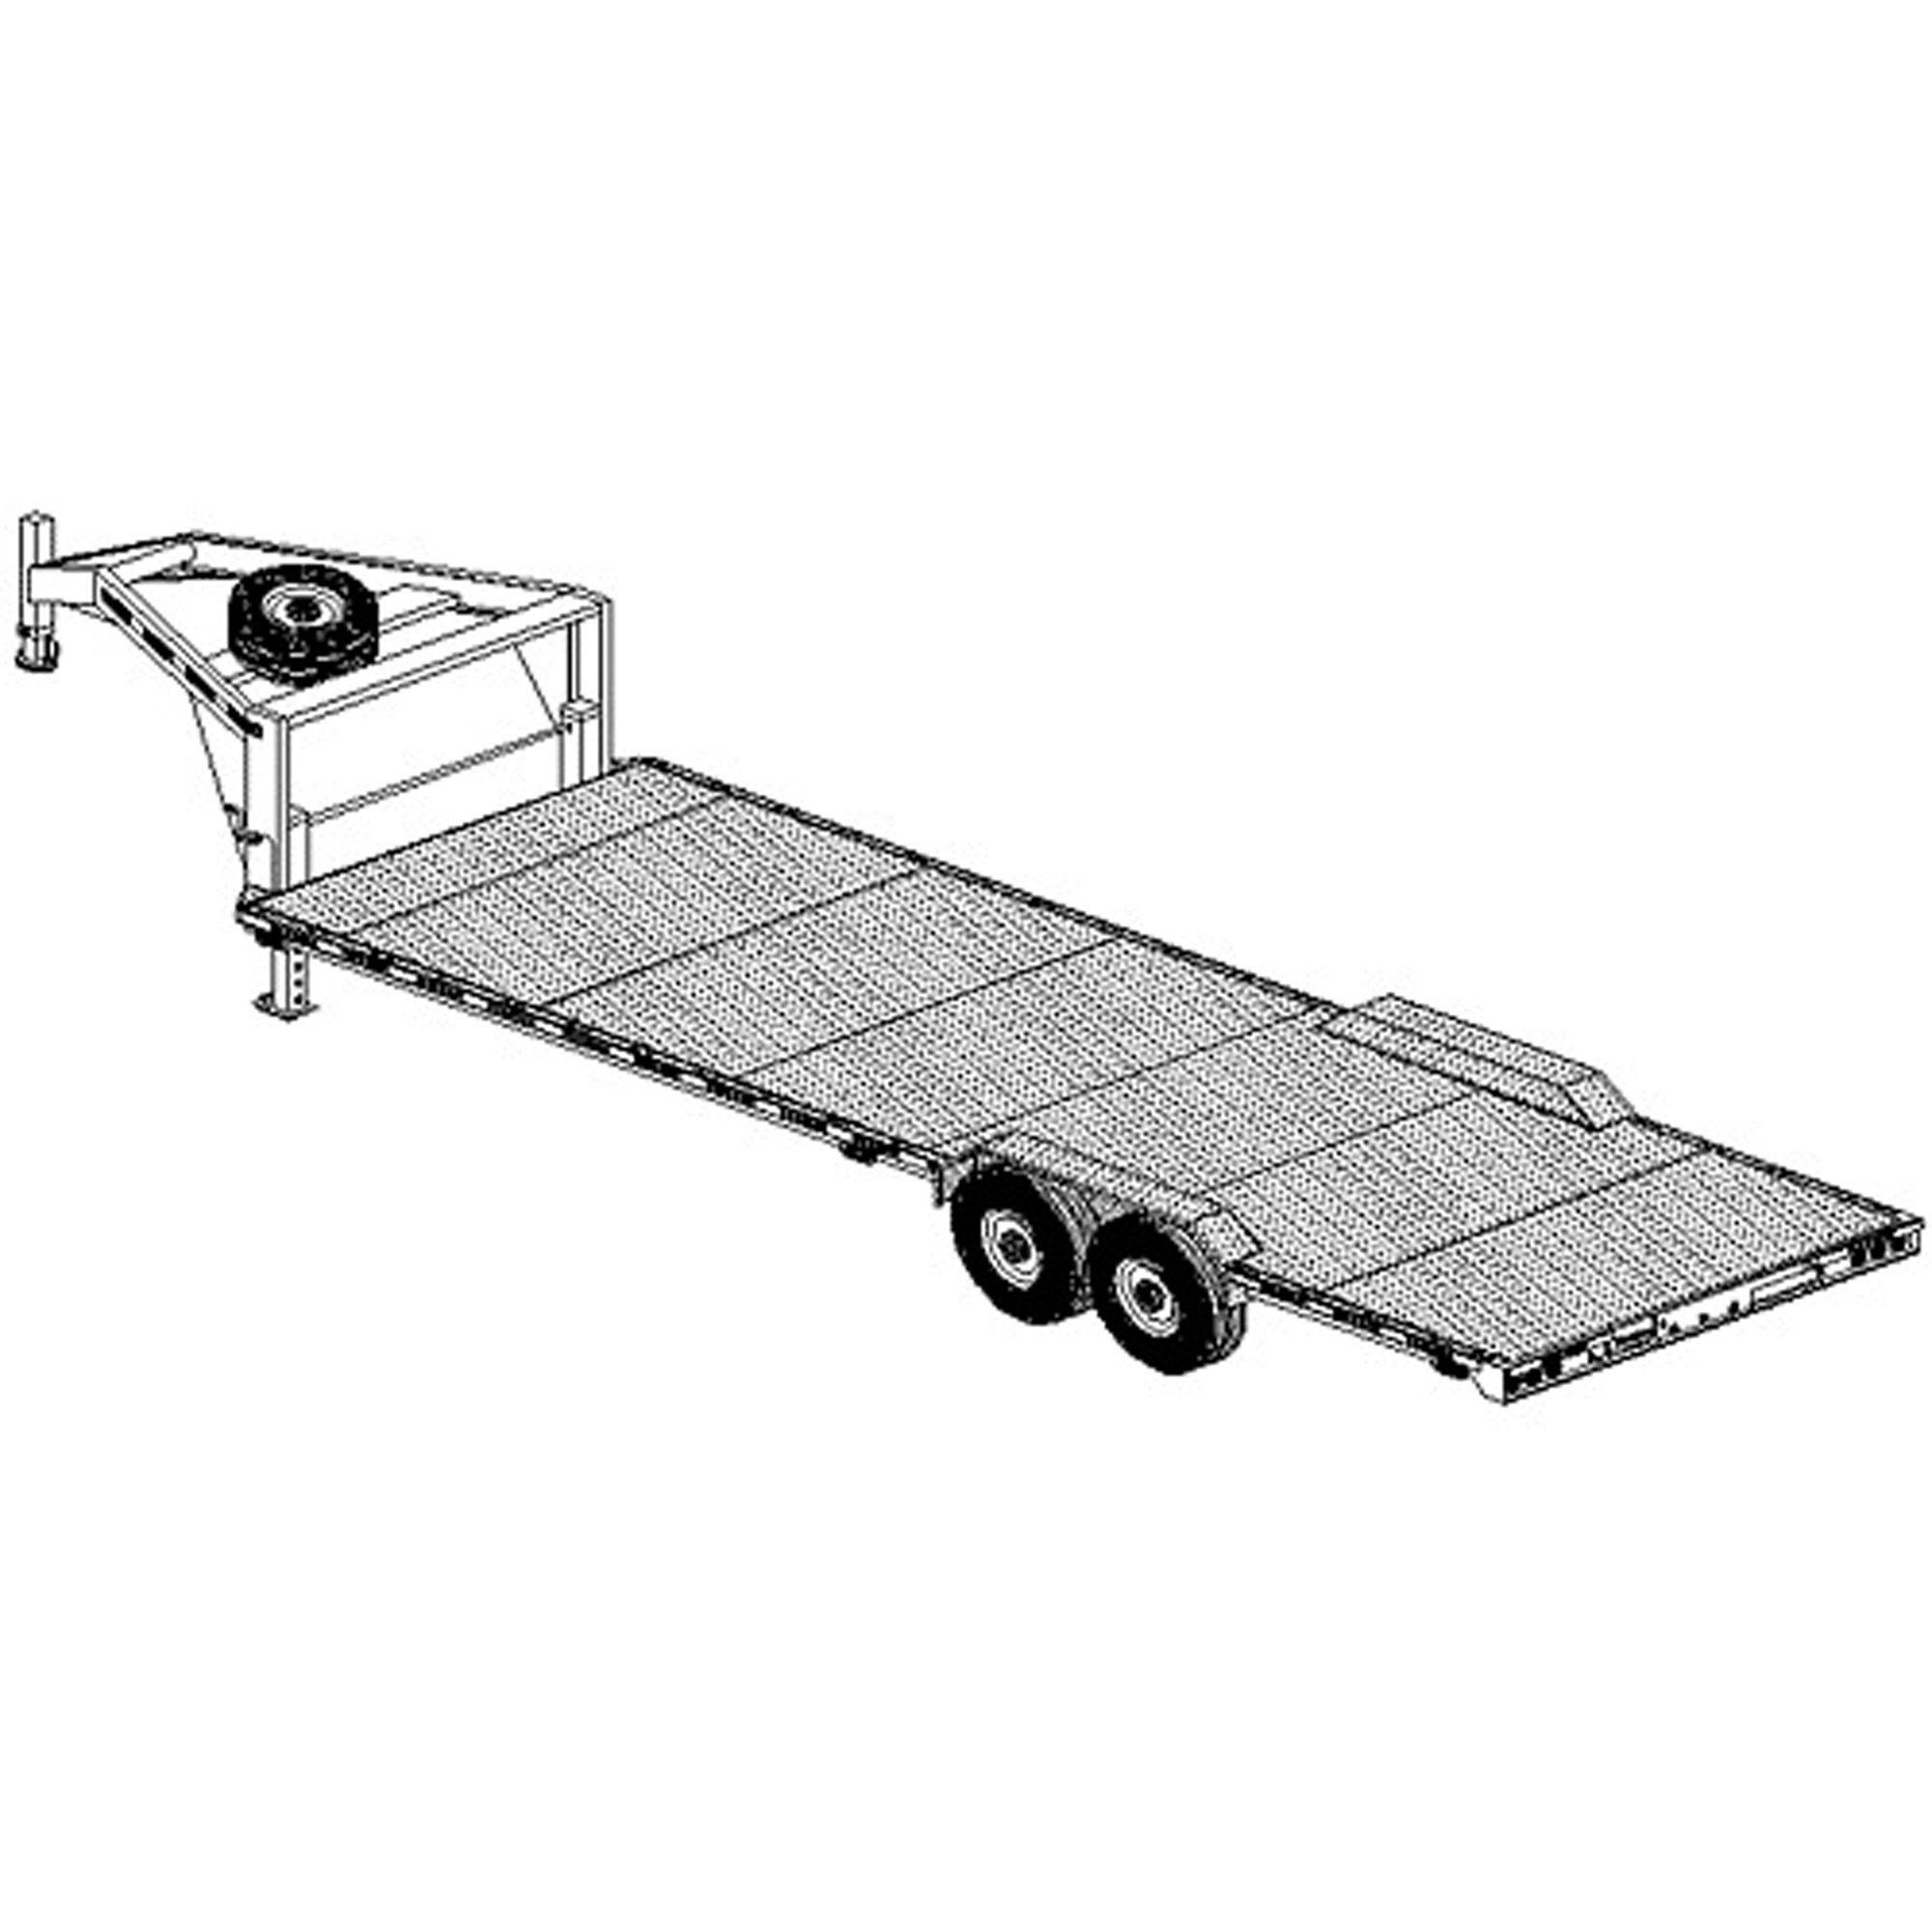 26 x102 gooseneck trailer plans model 26xt as seen on xtreme 4